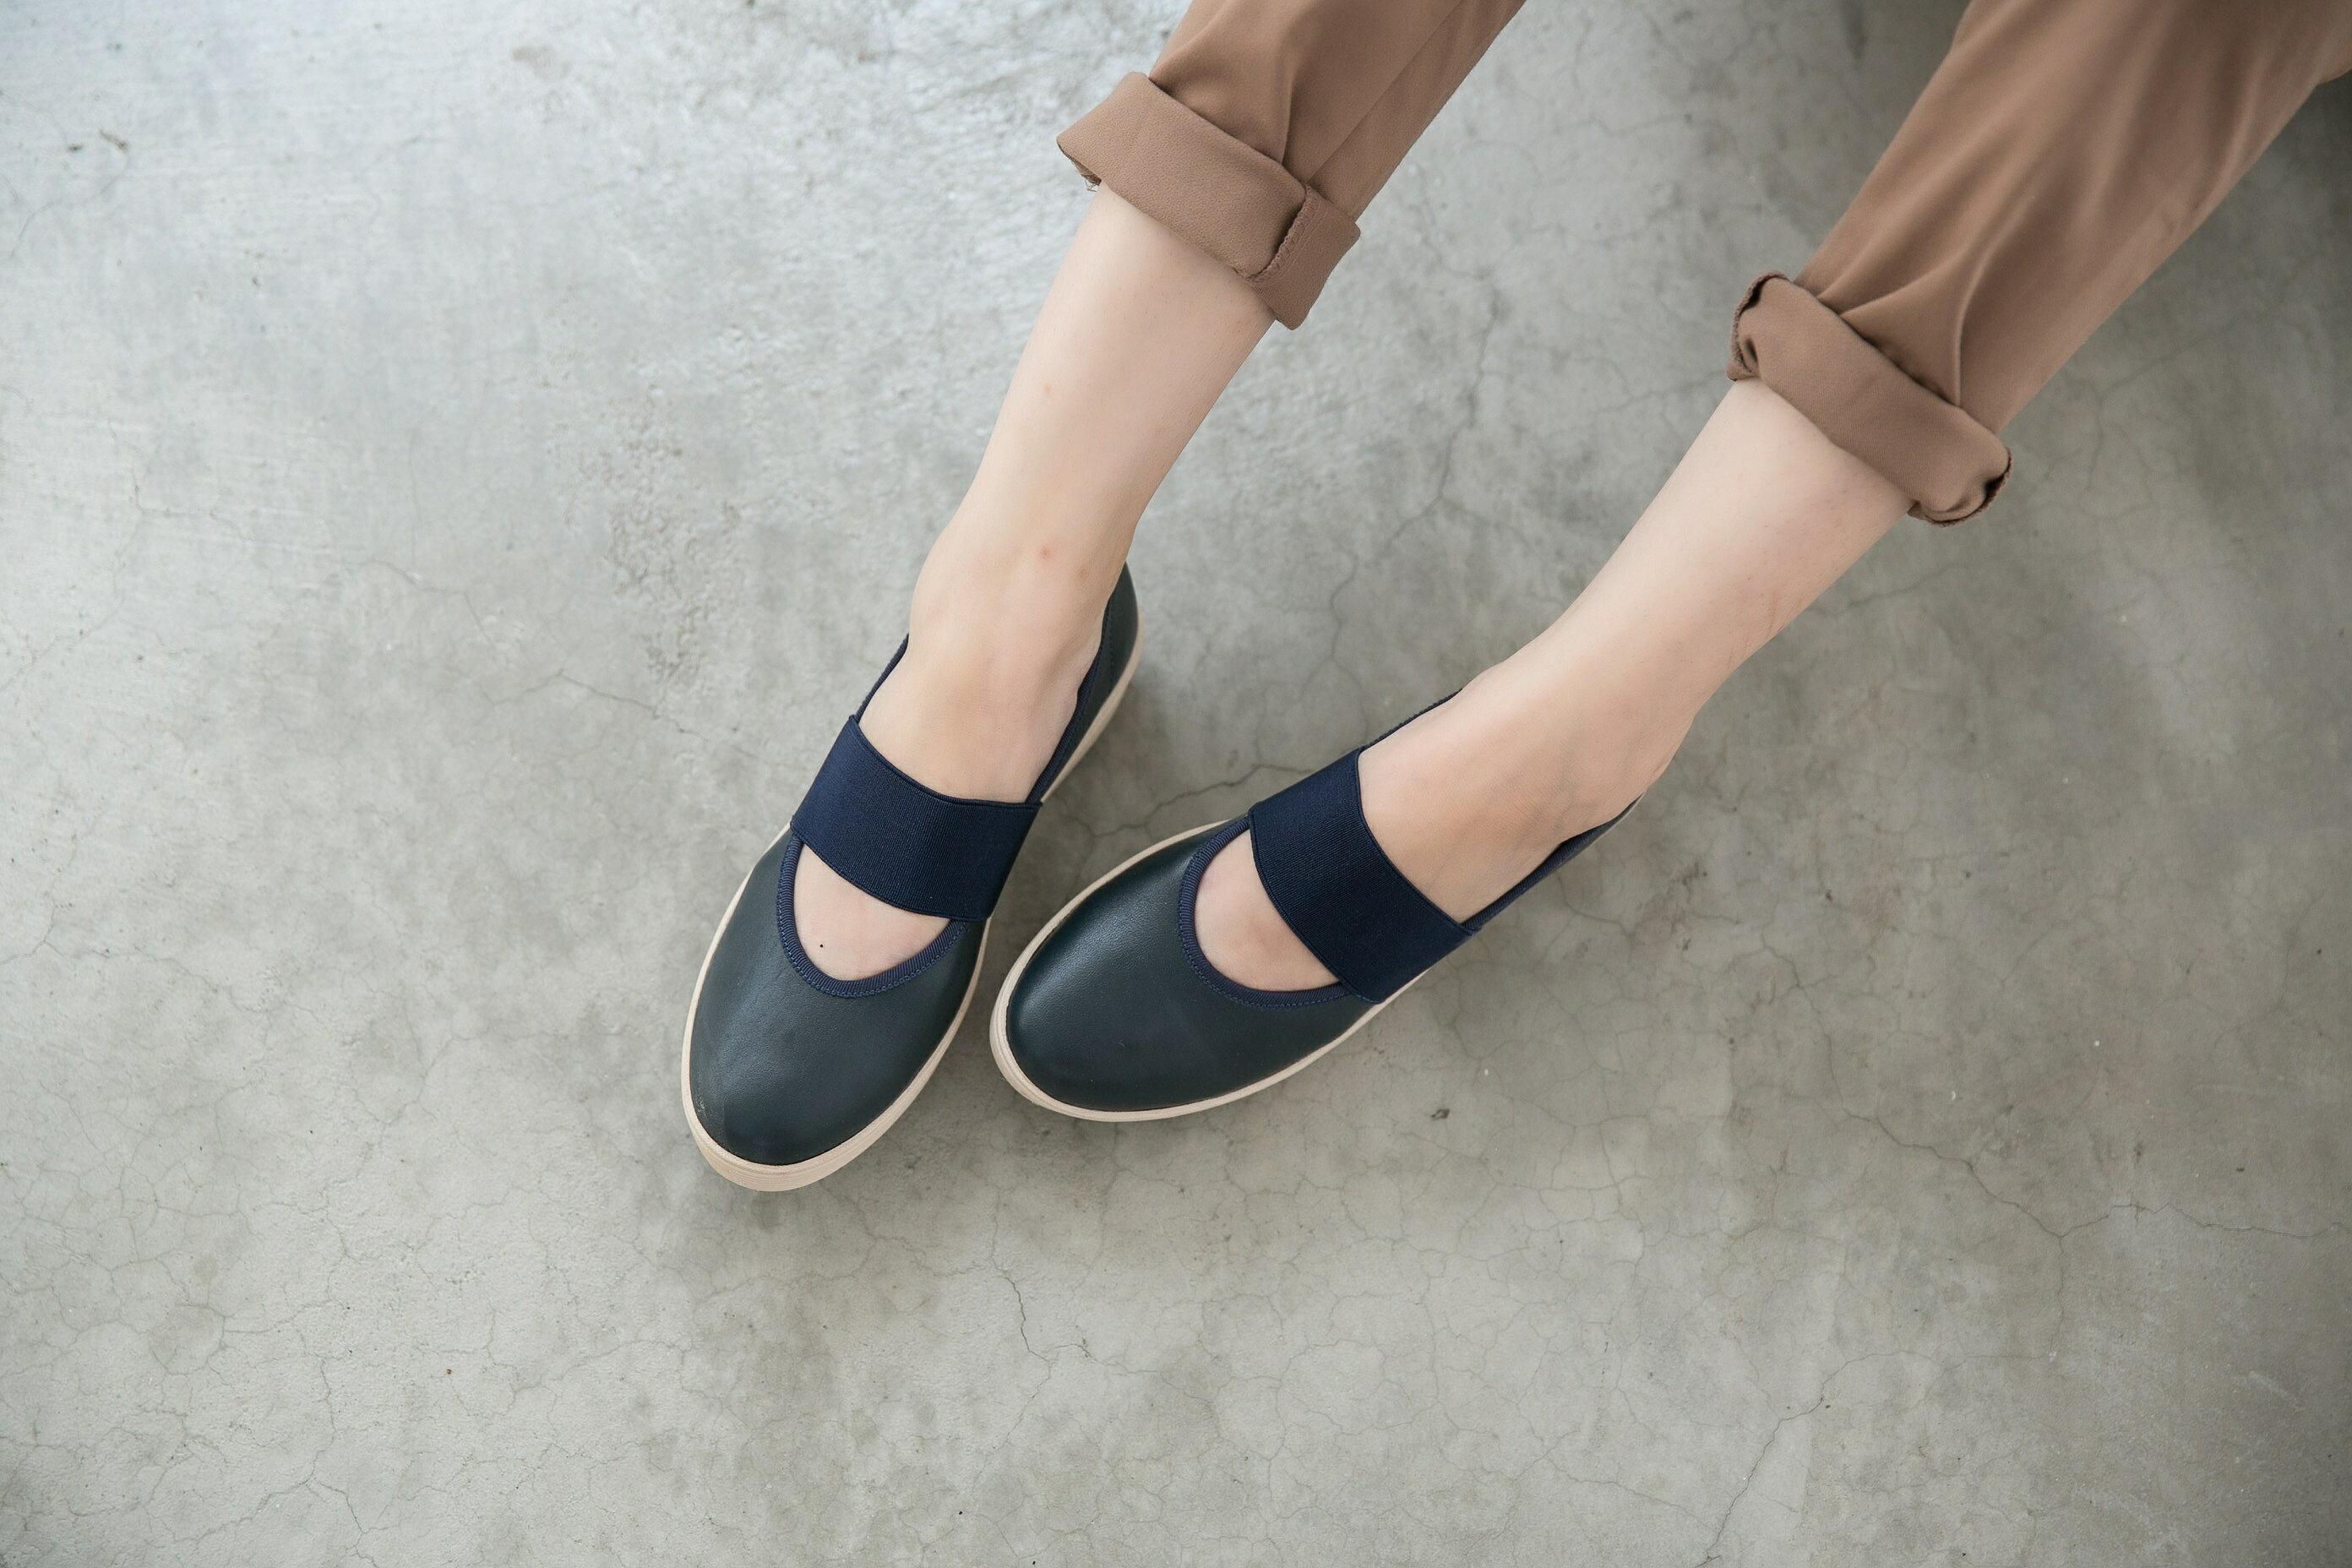 Aimez La Vie 超輕氣墊鞋|圓頭鬆緊帶厚牛皮休閒鞋 4